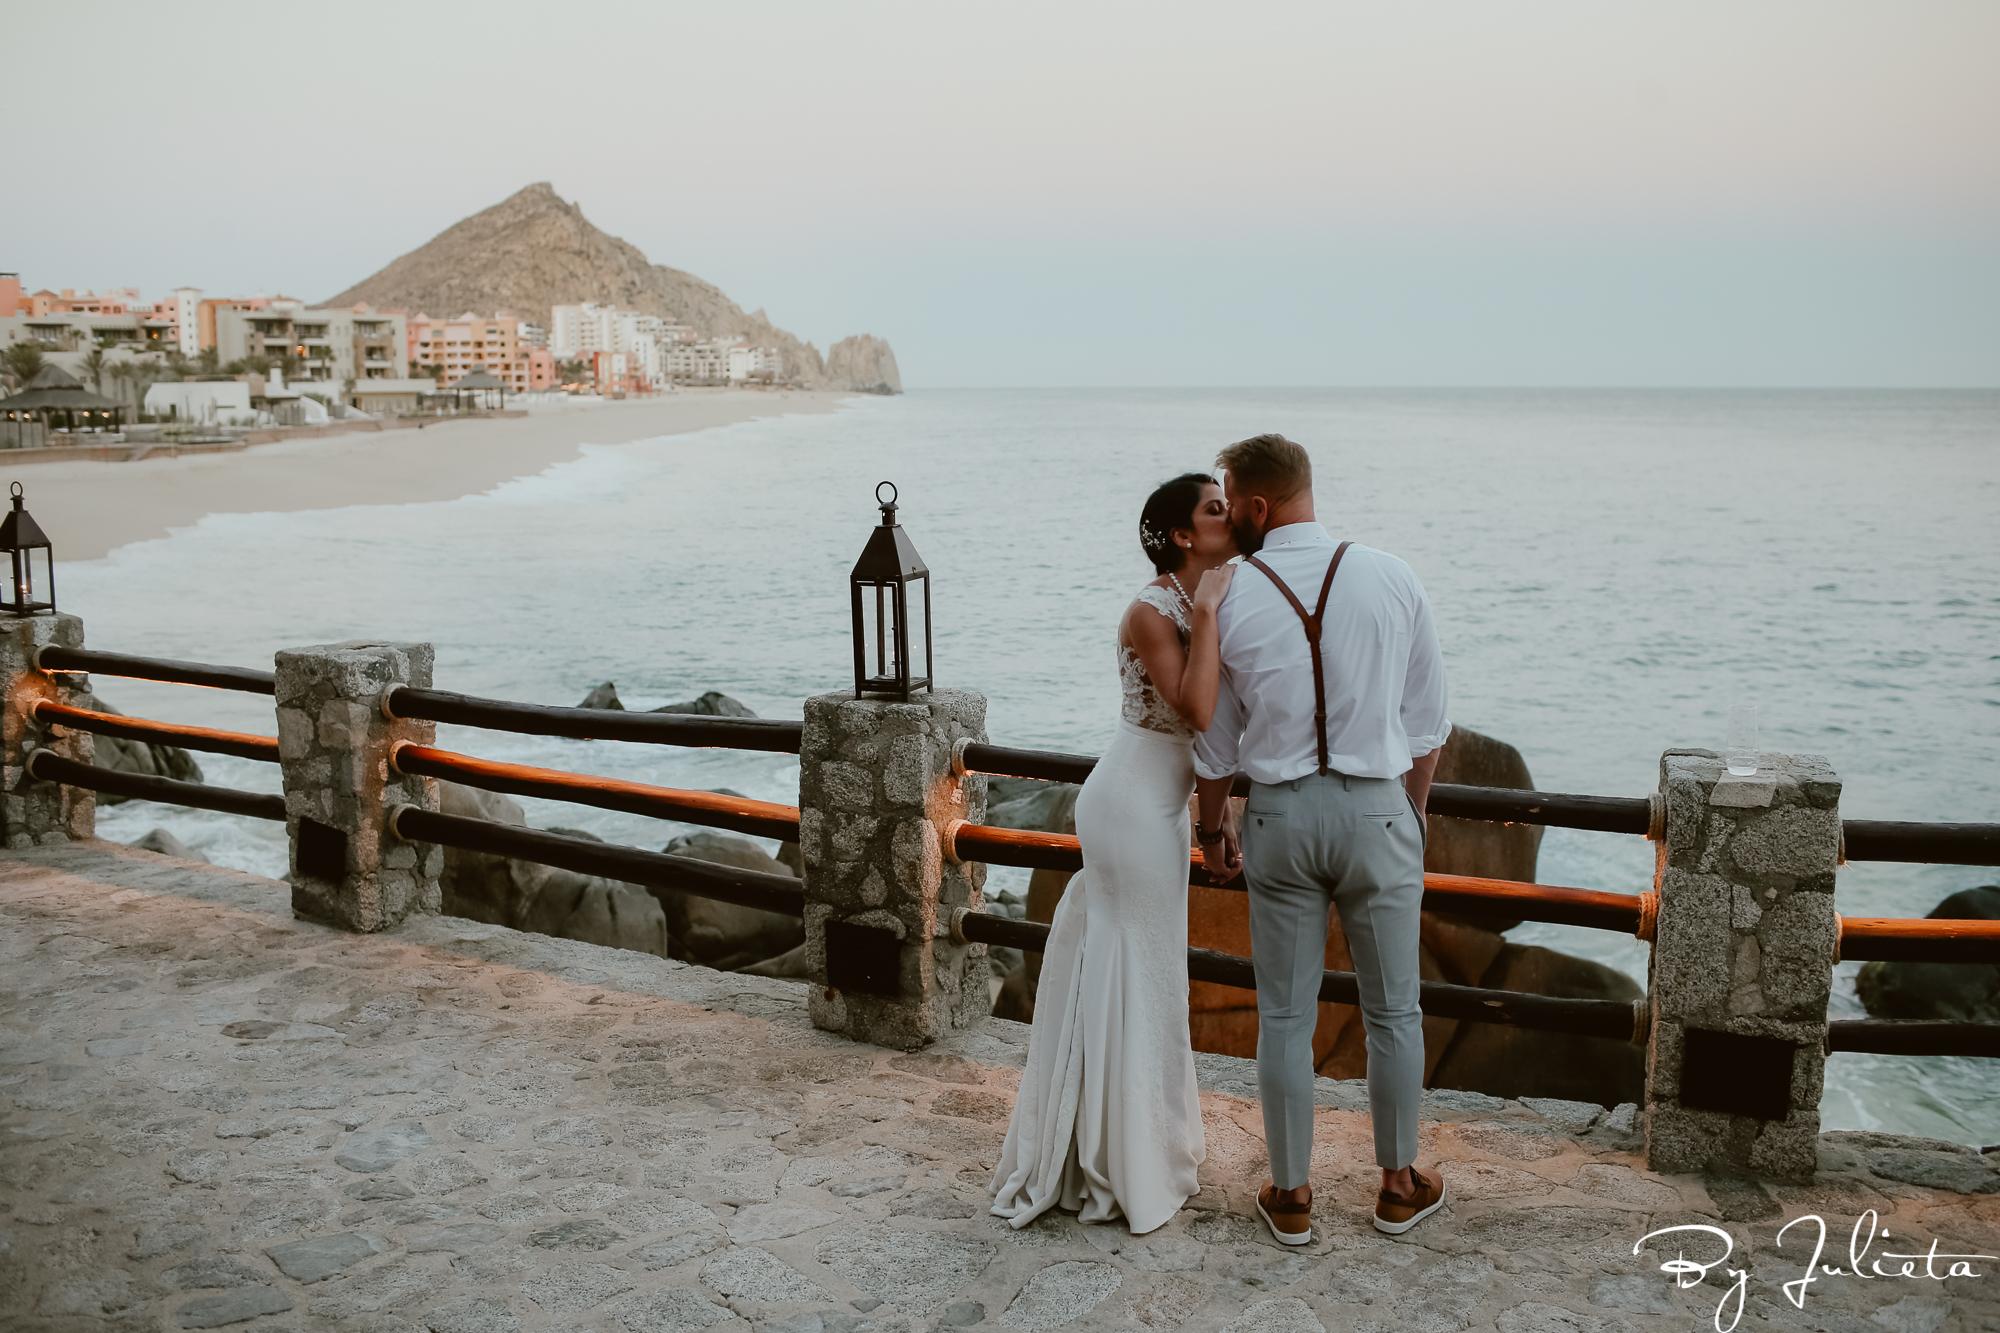 The Resort at Pedregal Wedding. T+C. Julieta Amezcua Photography.792.JPG